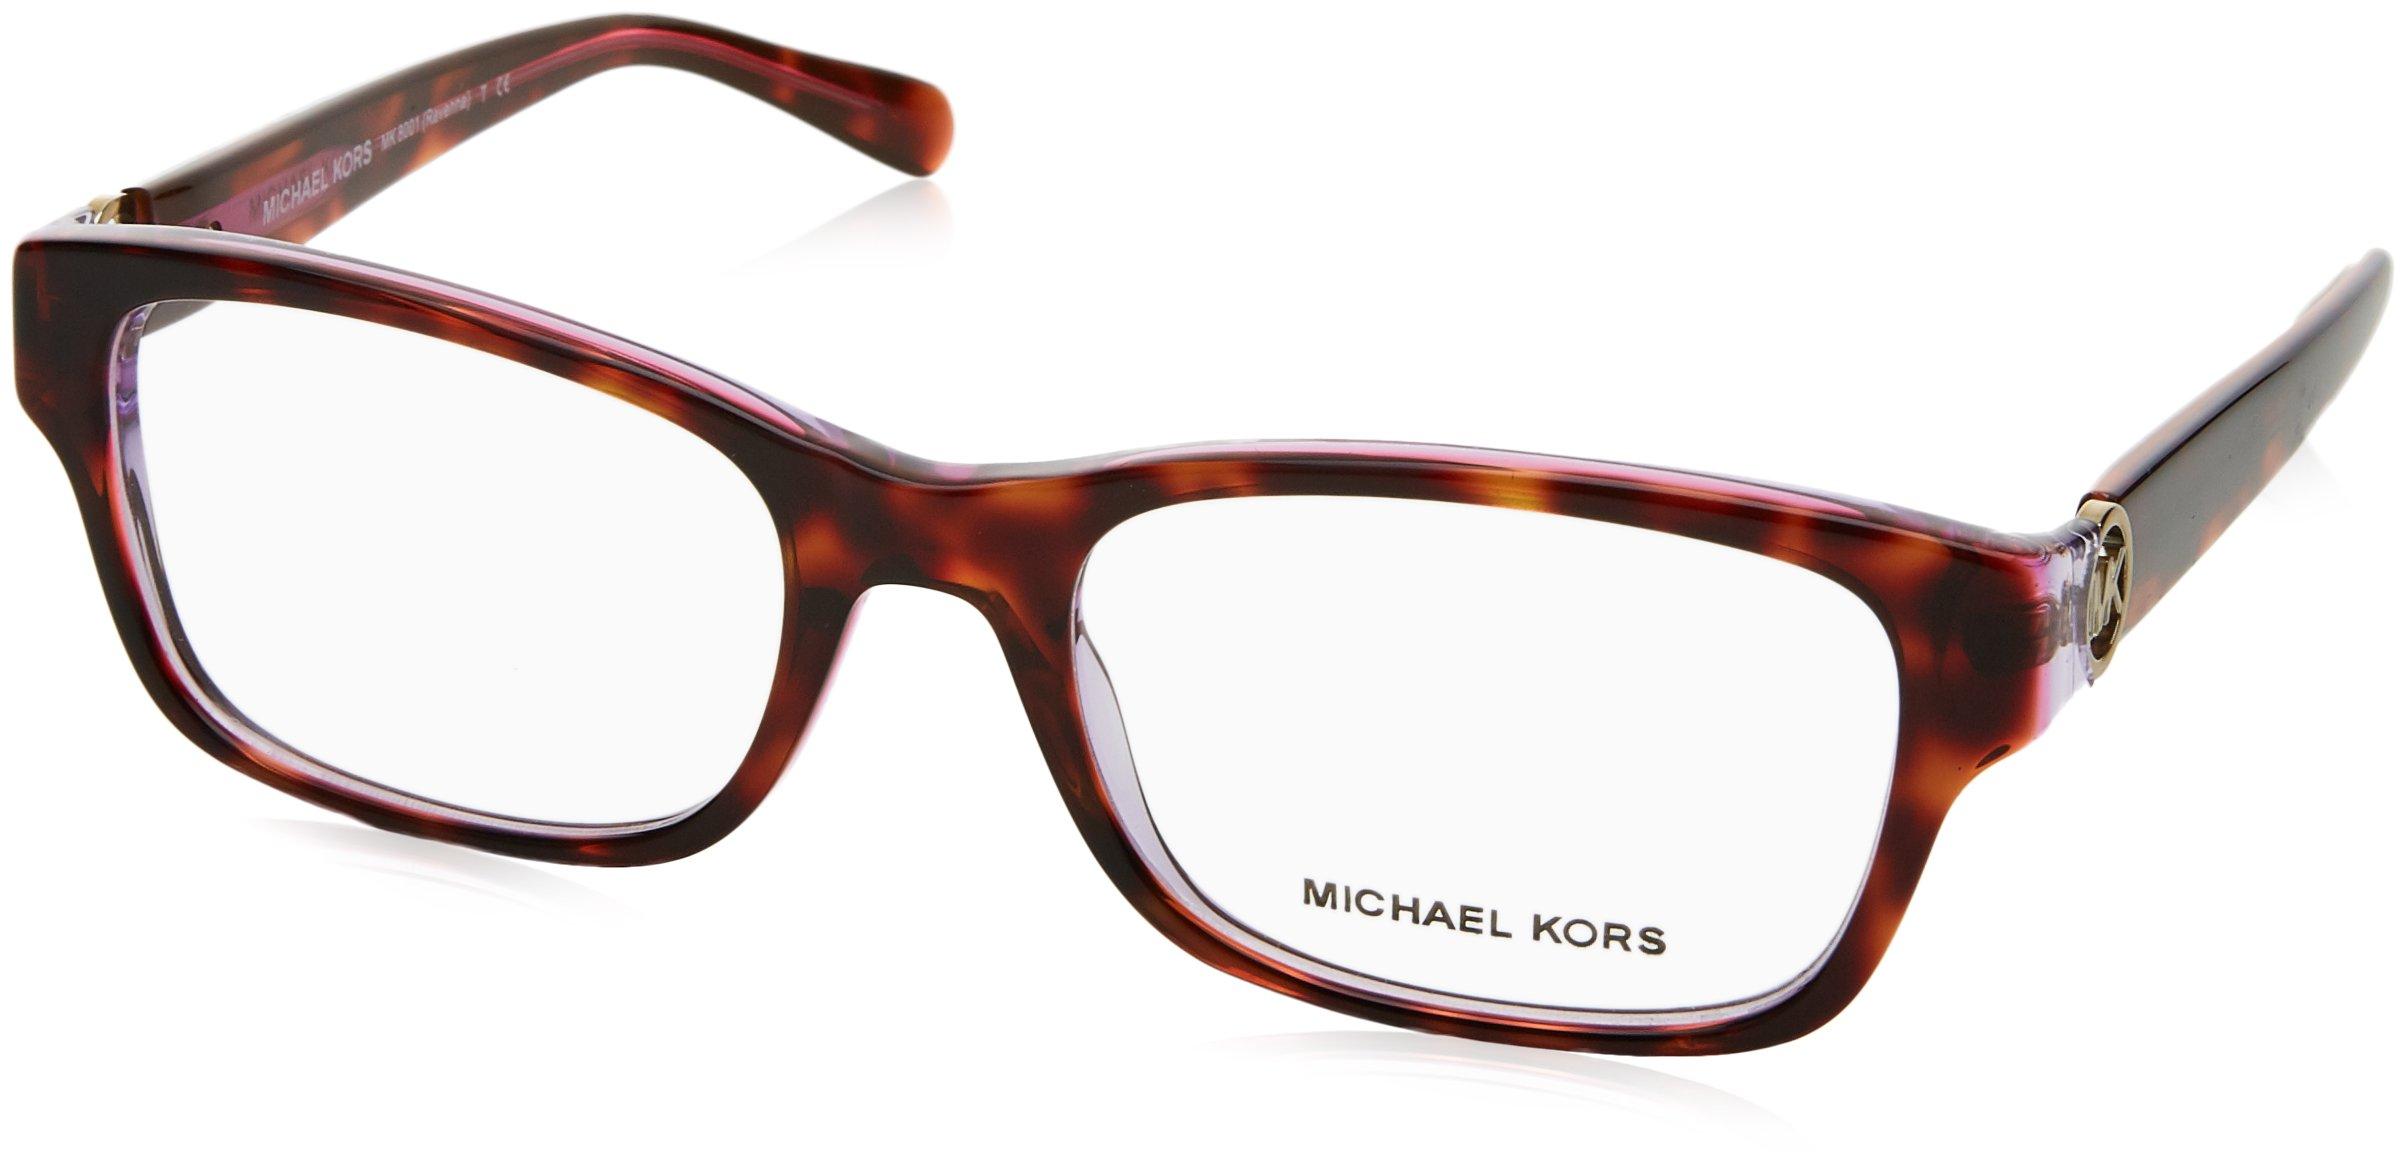 Michael Kors RAVENNA MK8001 Eyeglass Frames 3003-53 - Tortoise/Pink/Purple MK8001-3003-53